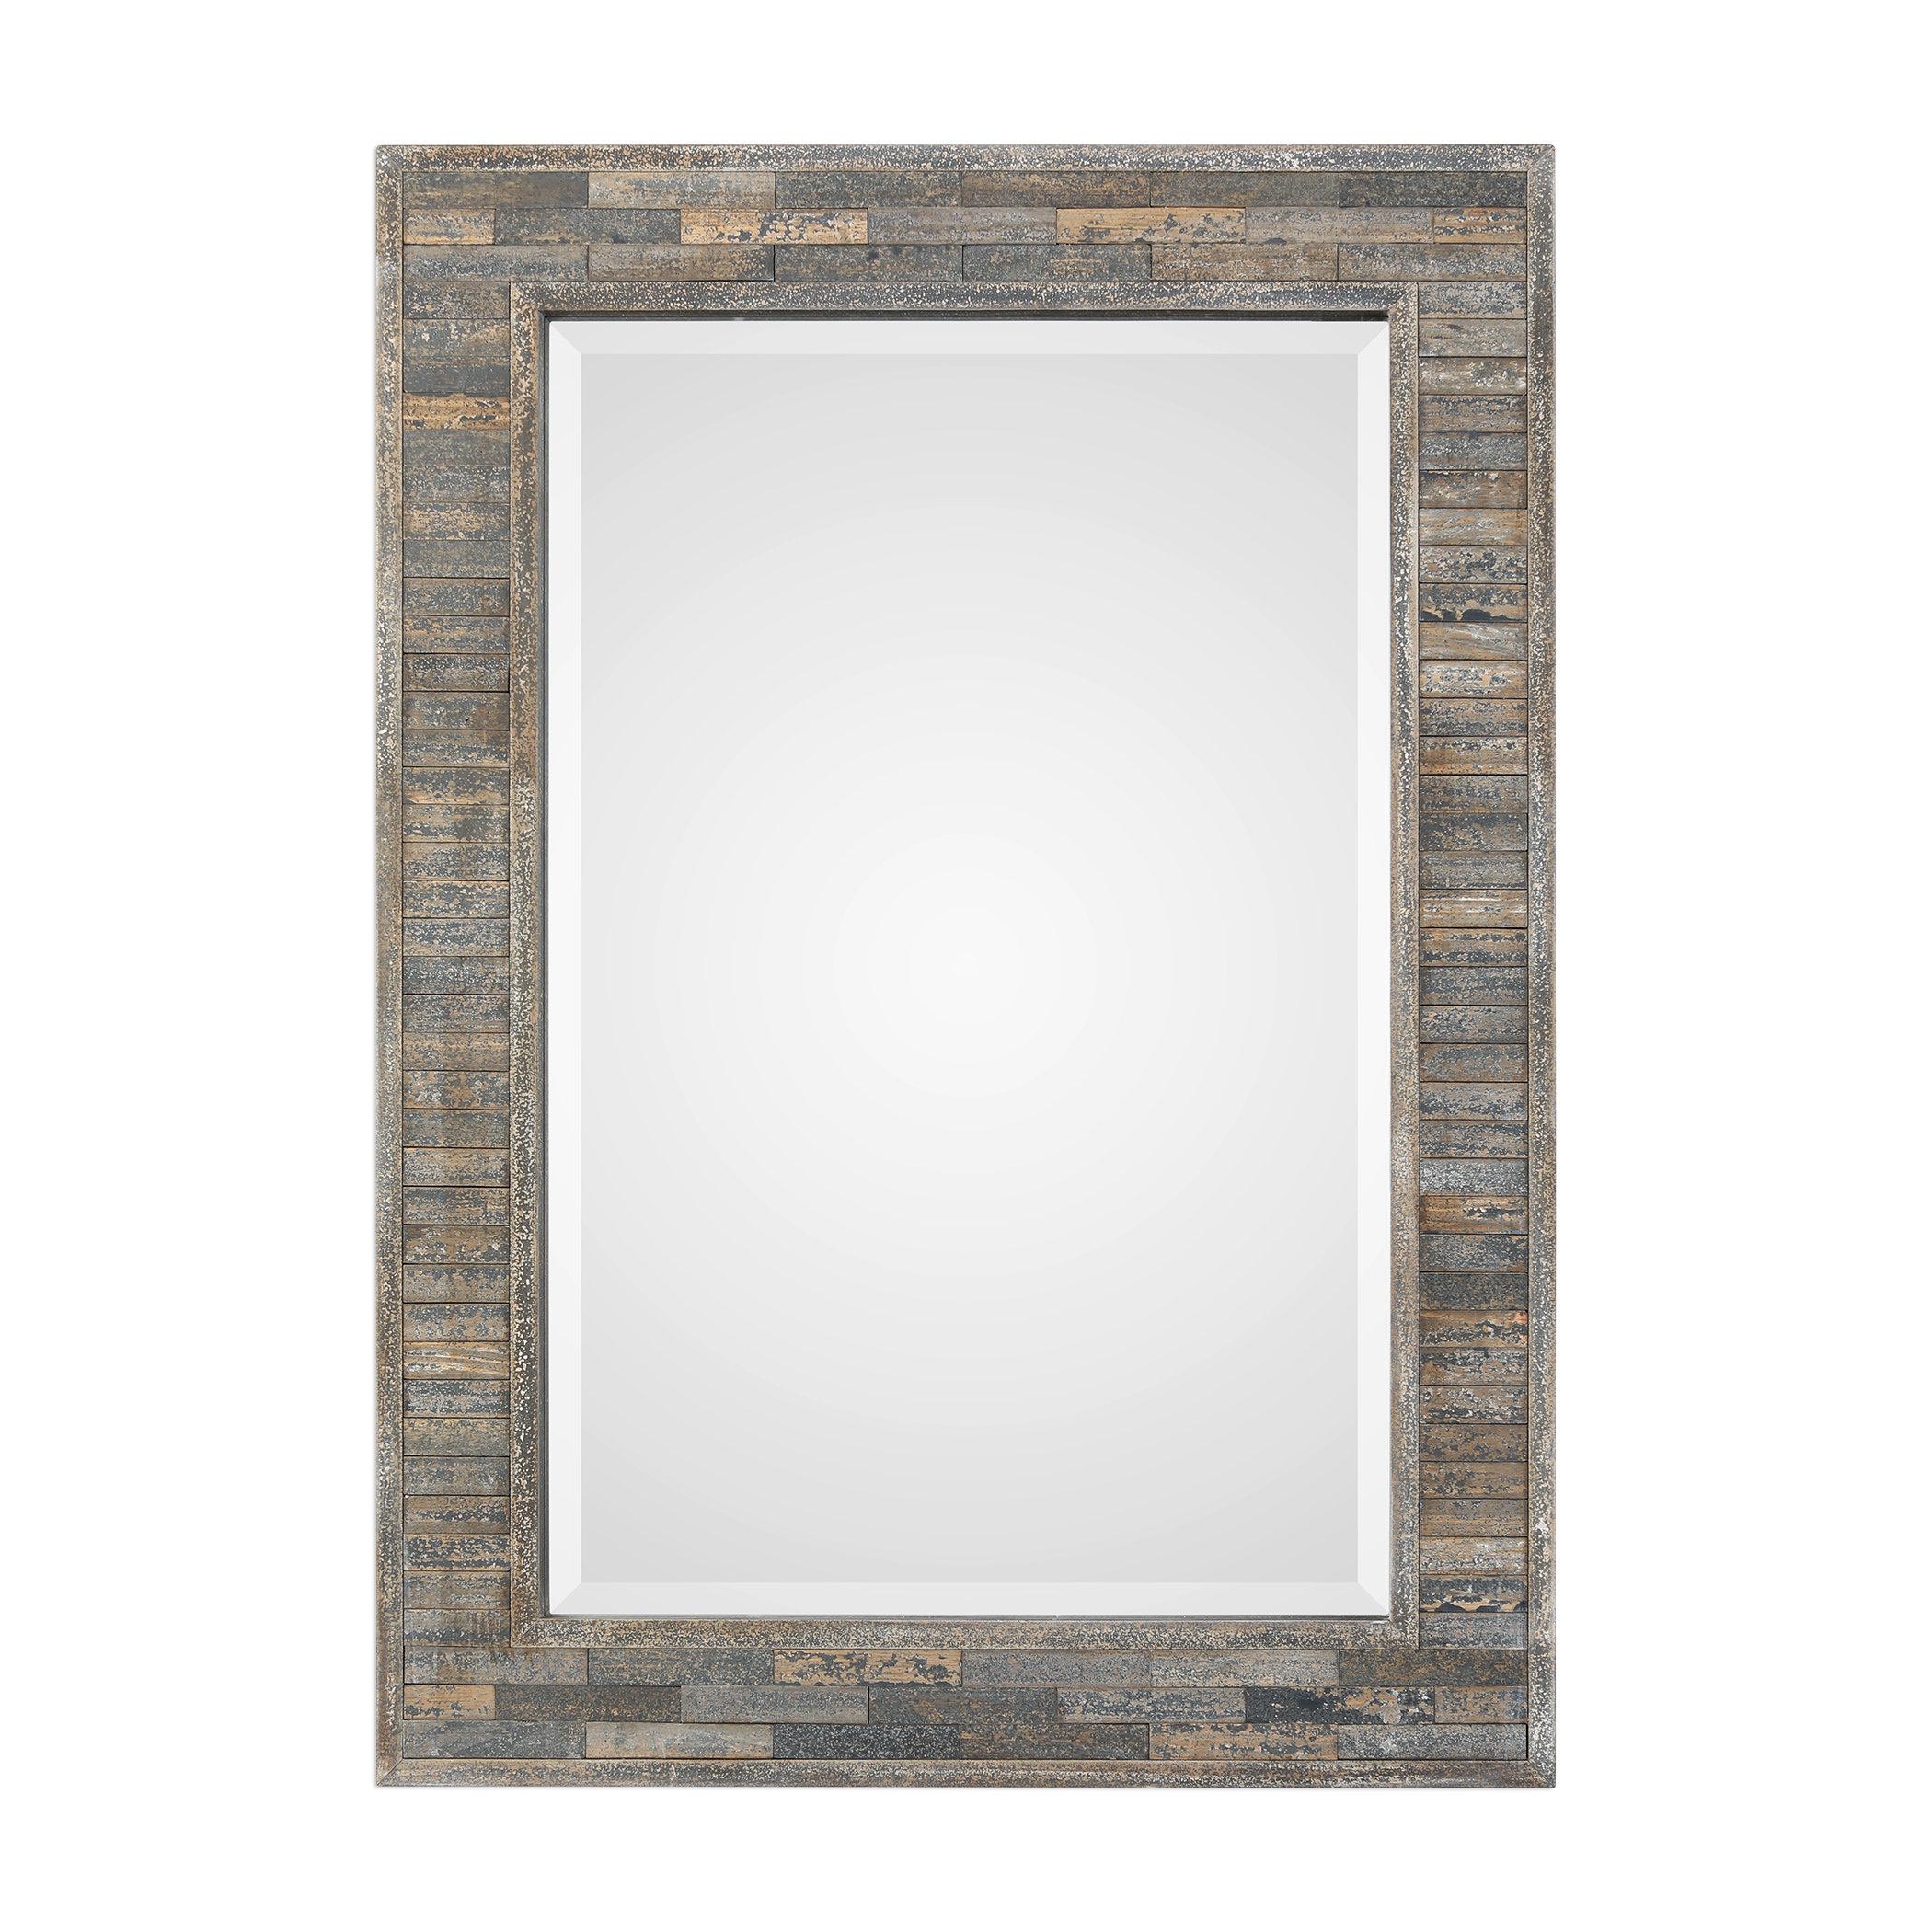 Farmhouse & Rustic Union Rustic Wall & Accent Mirrors In Perillo Burst Wood Accent Mirrors (Image 10 of 20)